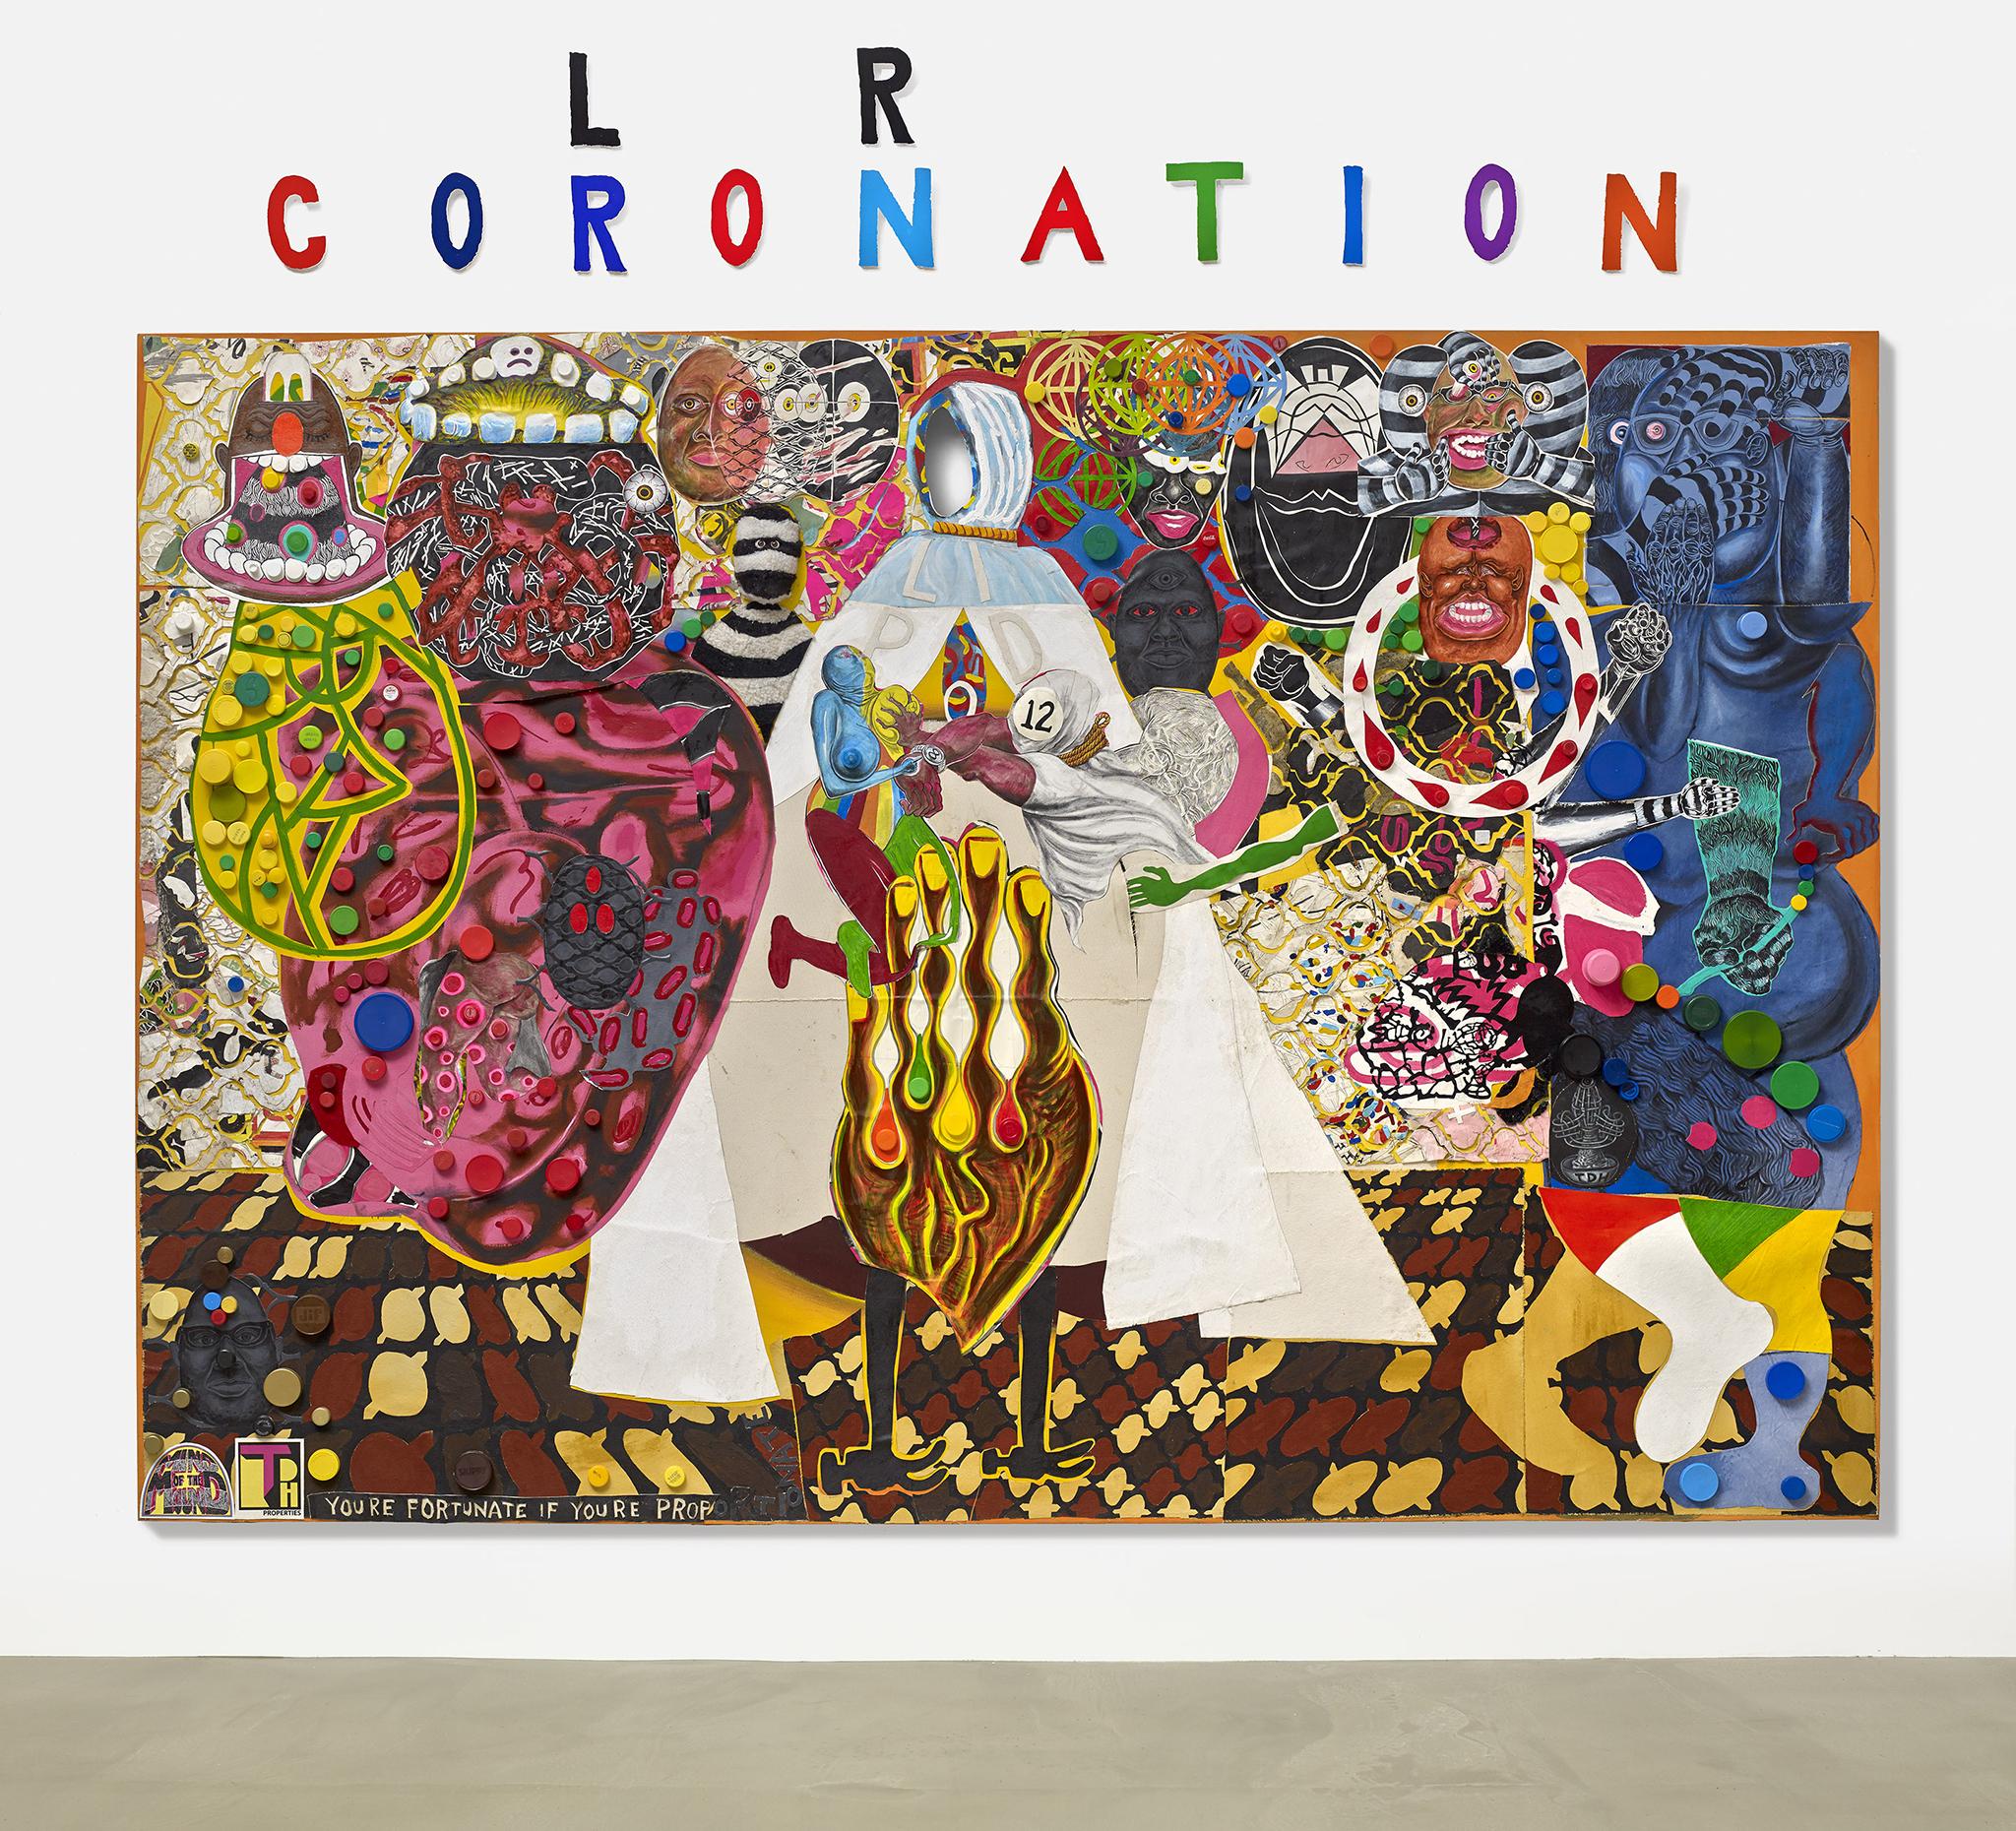 Trenton_Hancock-Coloration_Coronation_2016_4.jpg